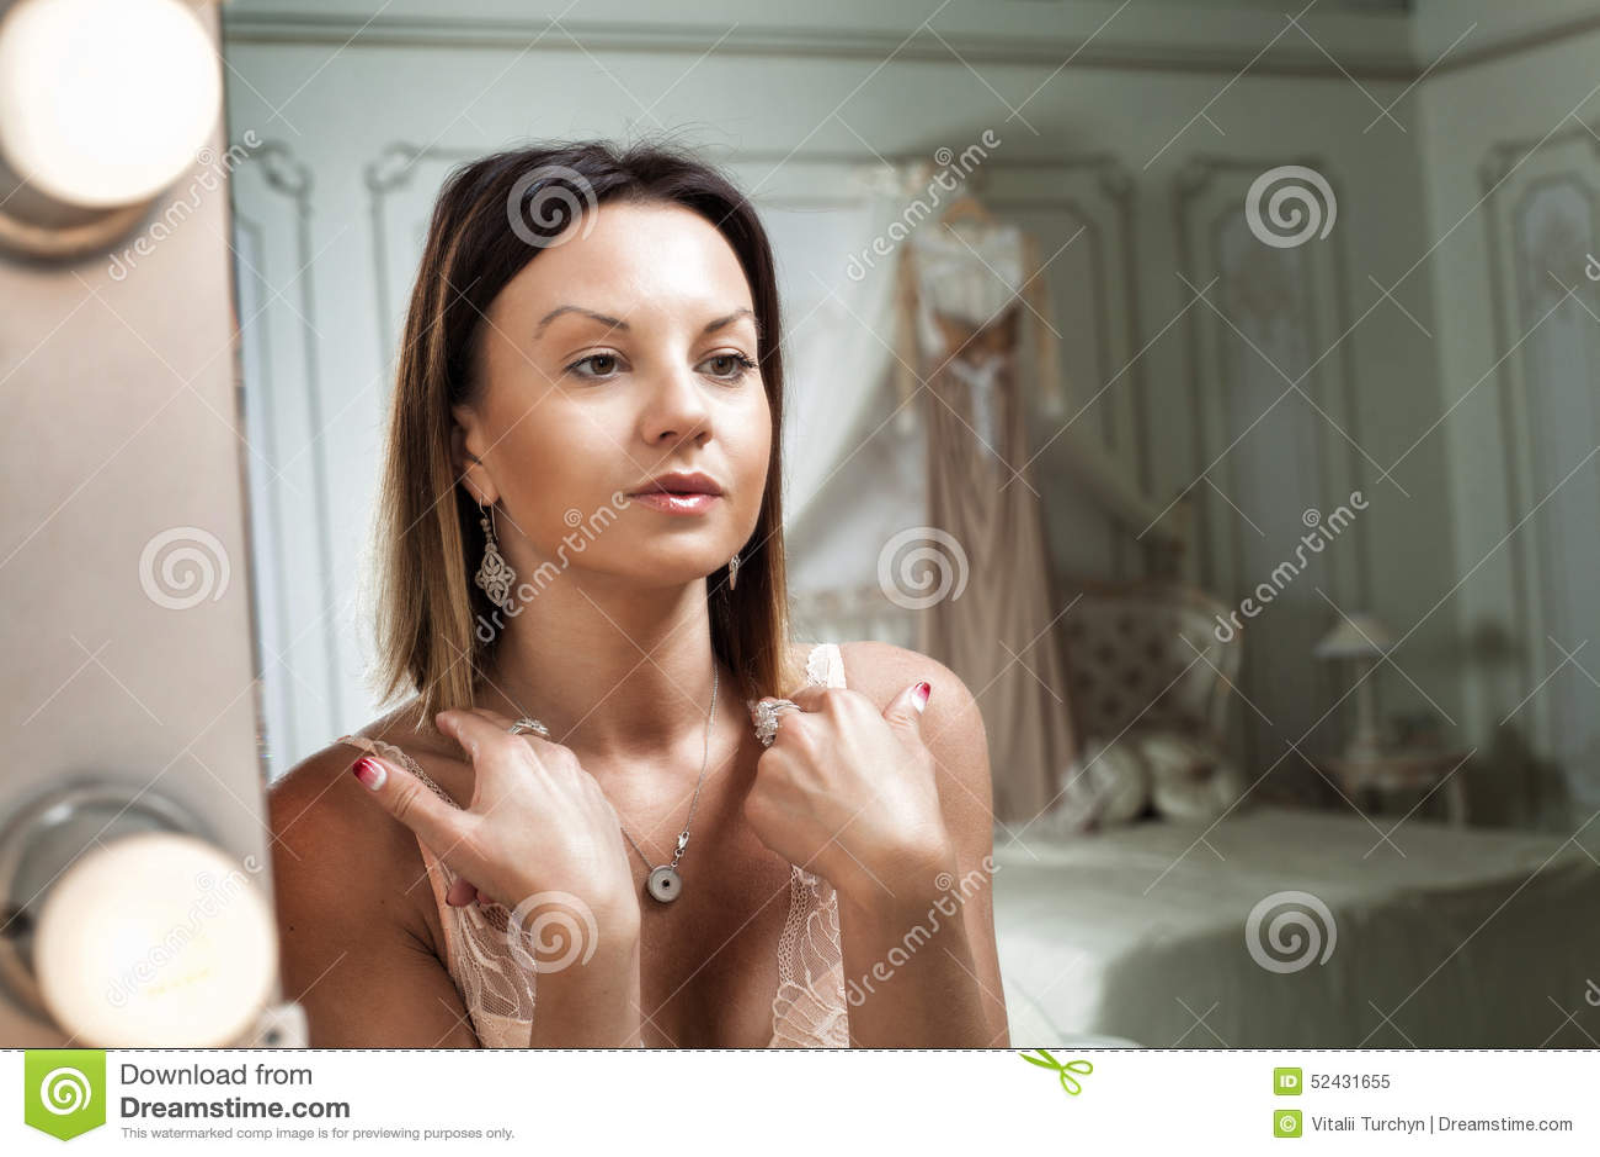 Game idea lingerie shower